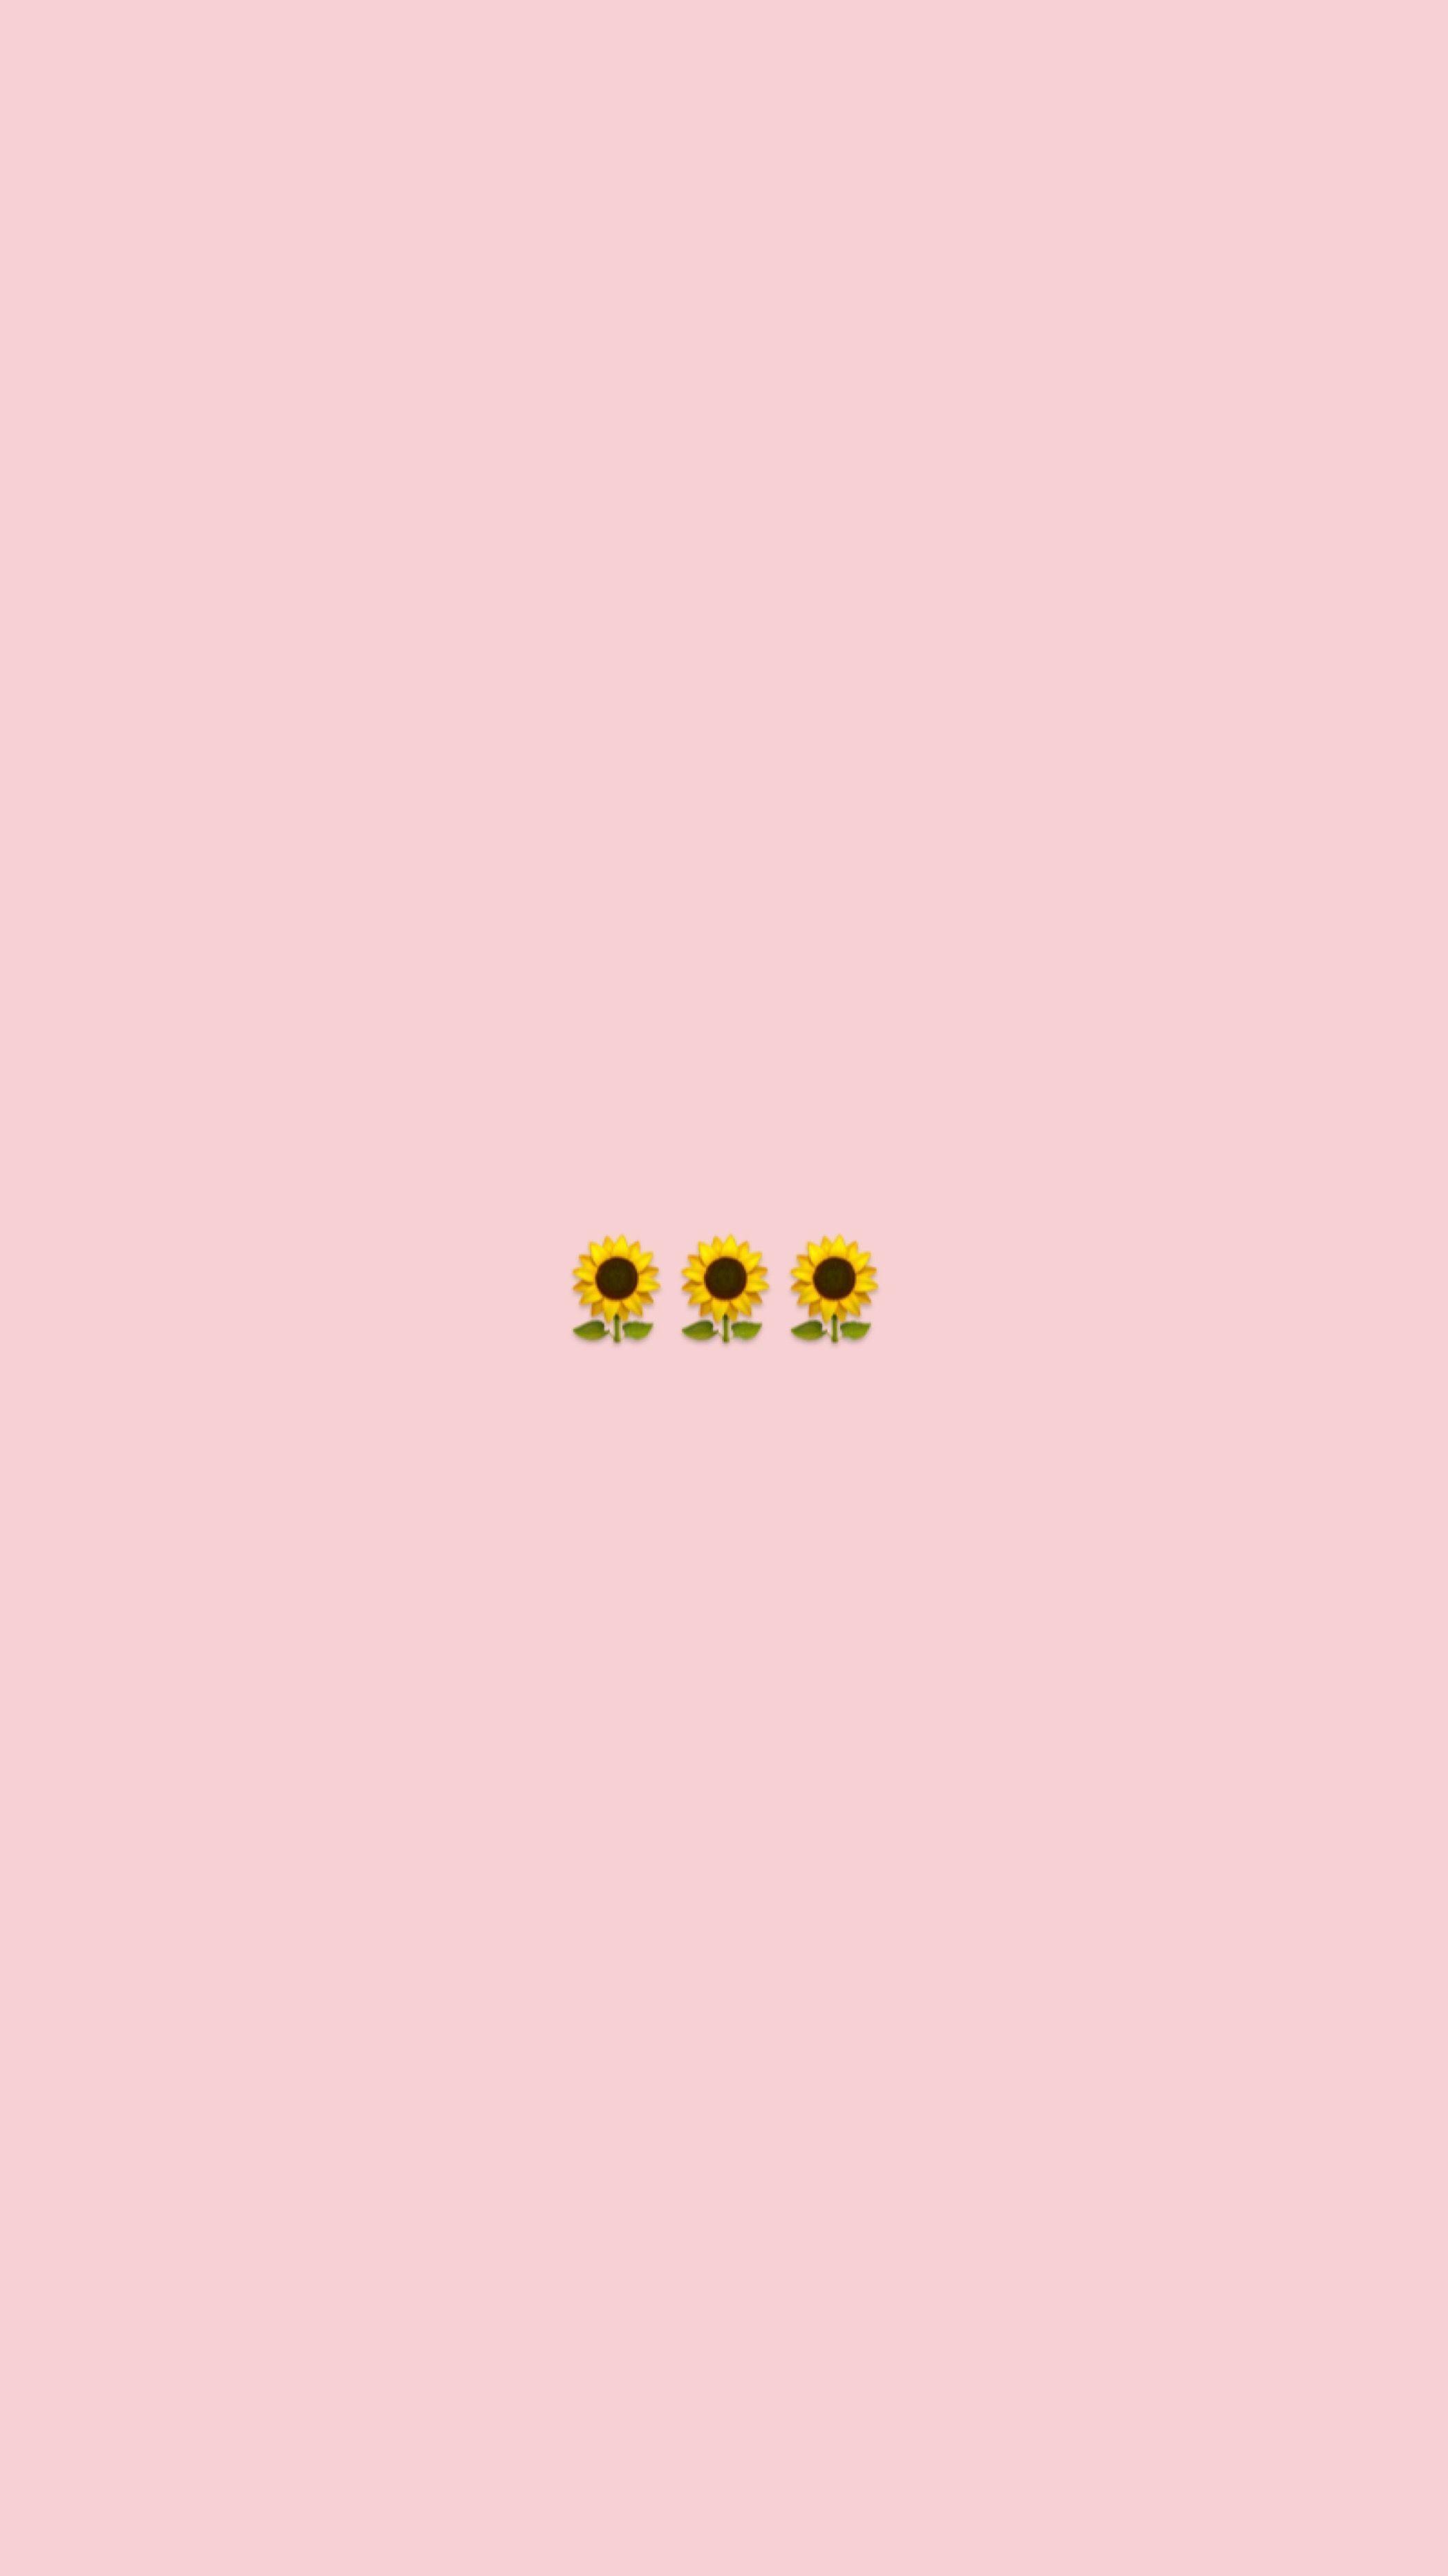 Background Cool Cute Emoji Galaxy Grunge Hipster Overlay Patterns Transparent Tumblr Wallpaper Image 2704237 By Patr Lucu Wallpaper Ponsel Gambar